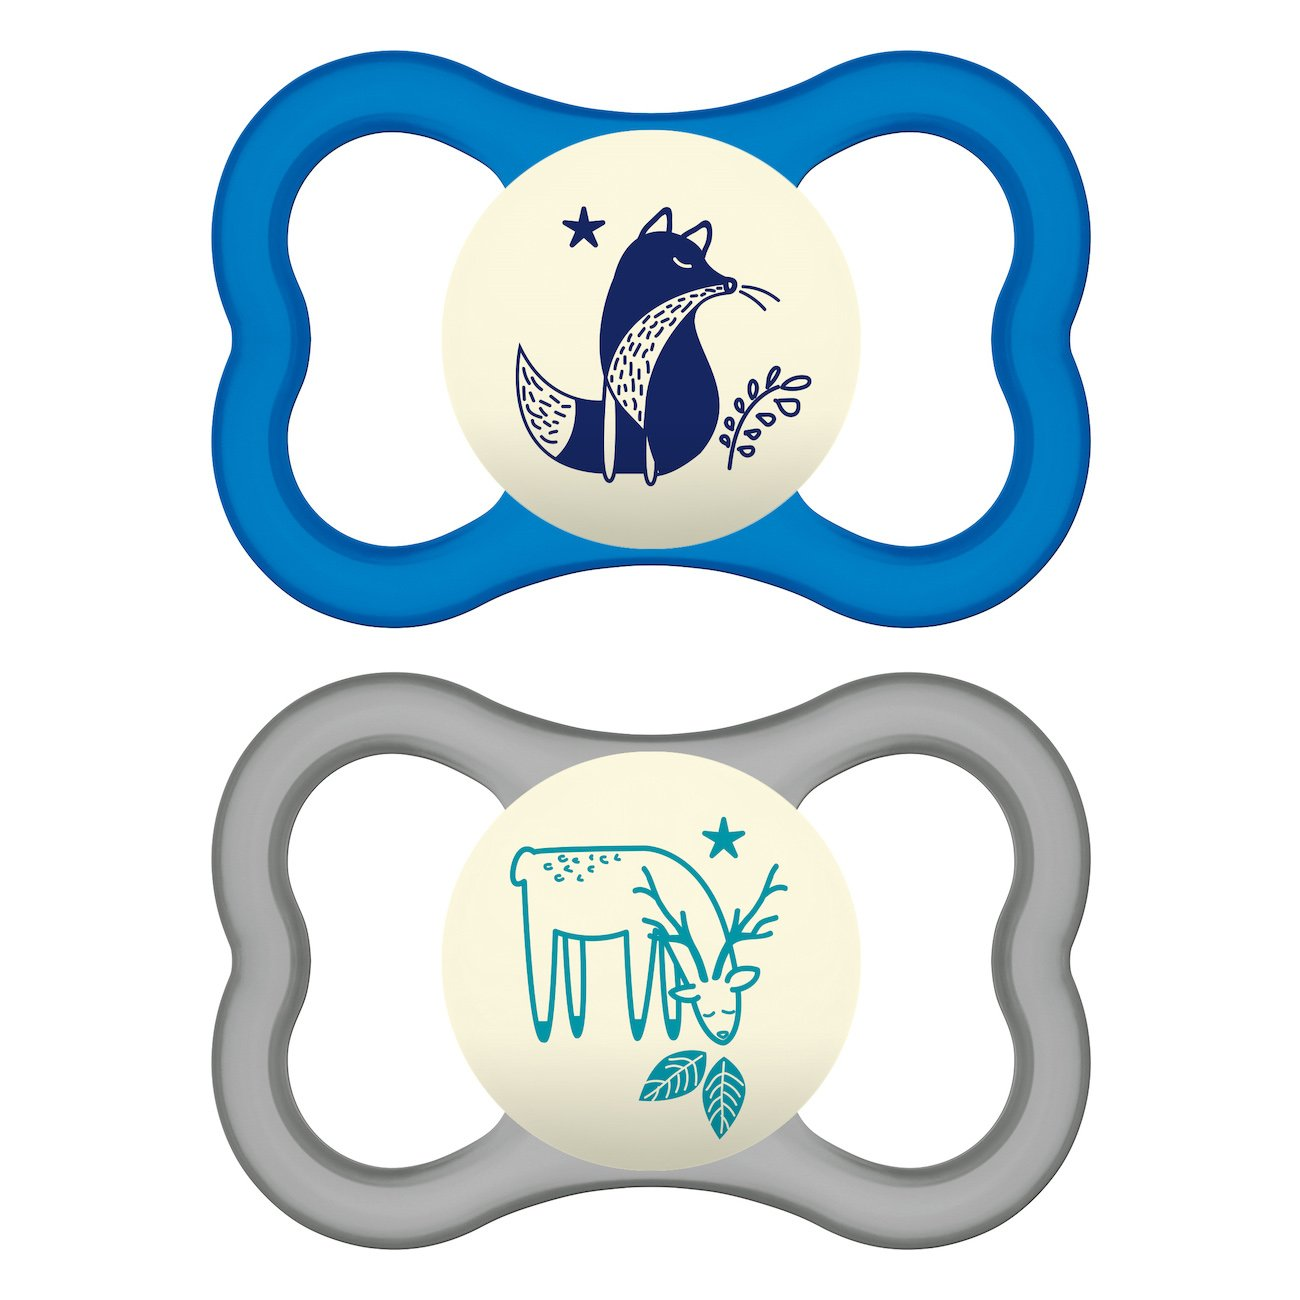 Mam Air Night Animal Ορθοδοντική Πιπίλα Σιλικόνης που Λάμπει στο Σκοτάδι Κωδ 277S από 16+ Μηνών 2 Τεμάχια – Μπλε – Γκρι